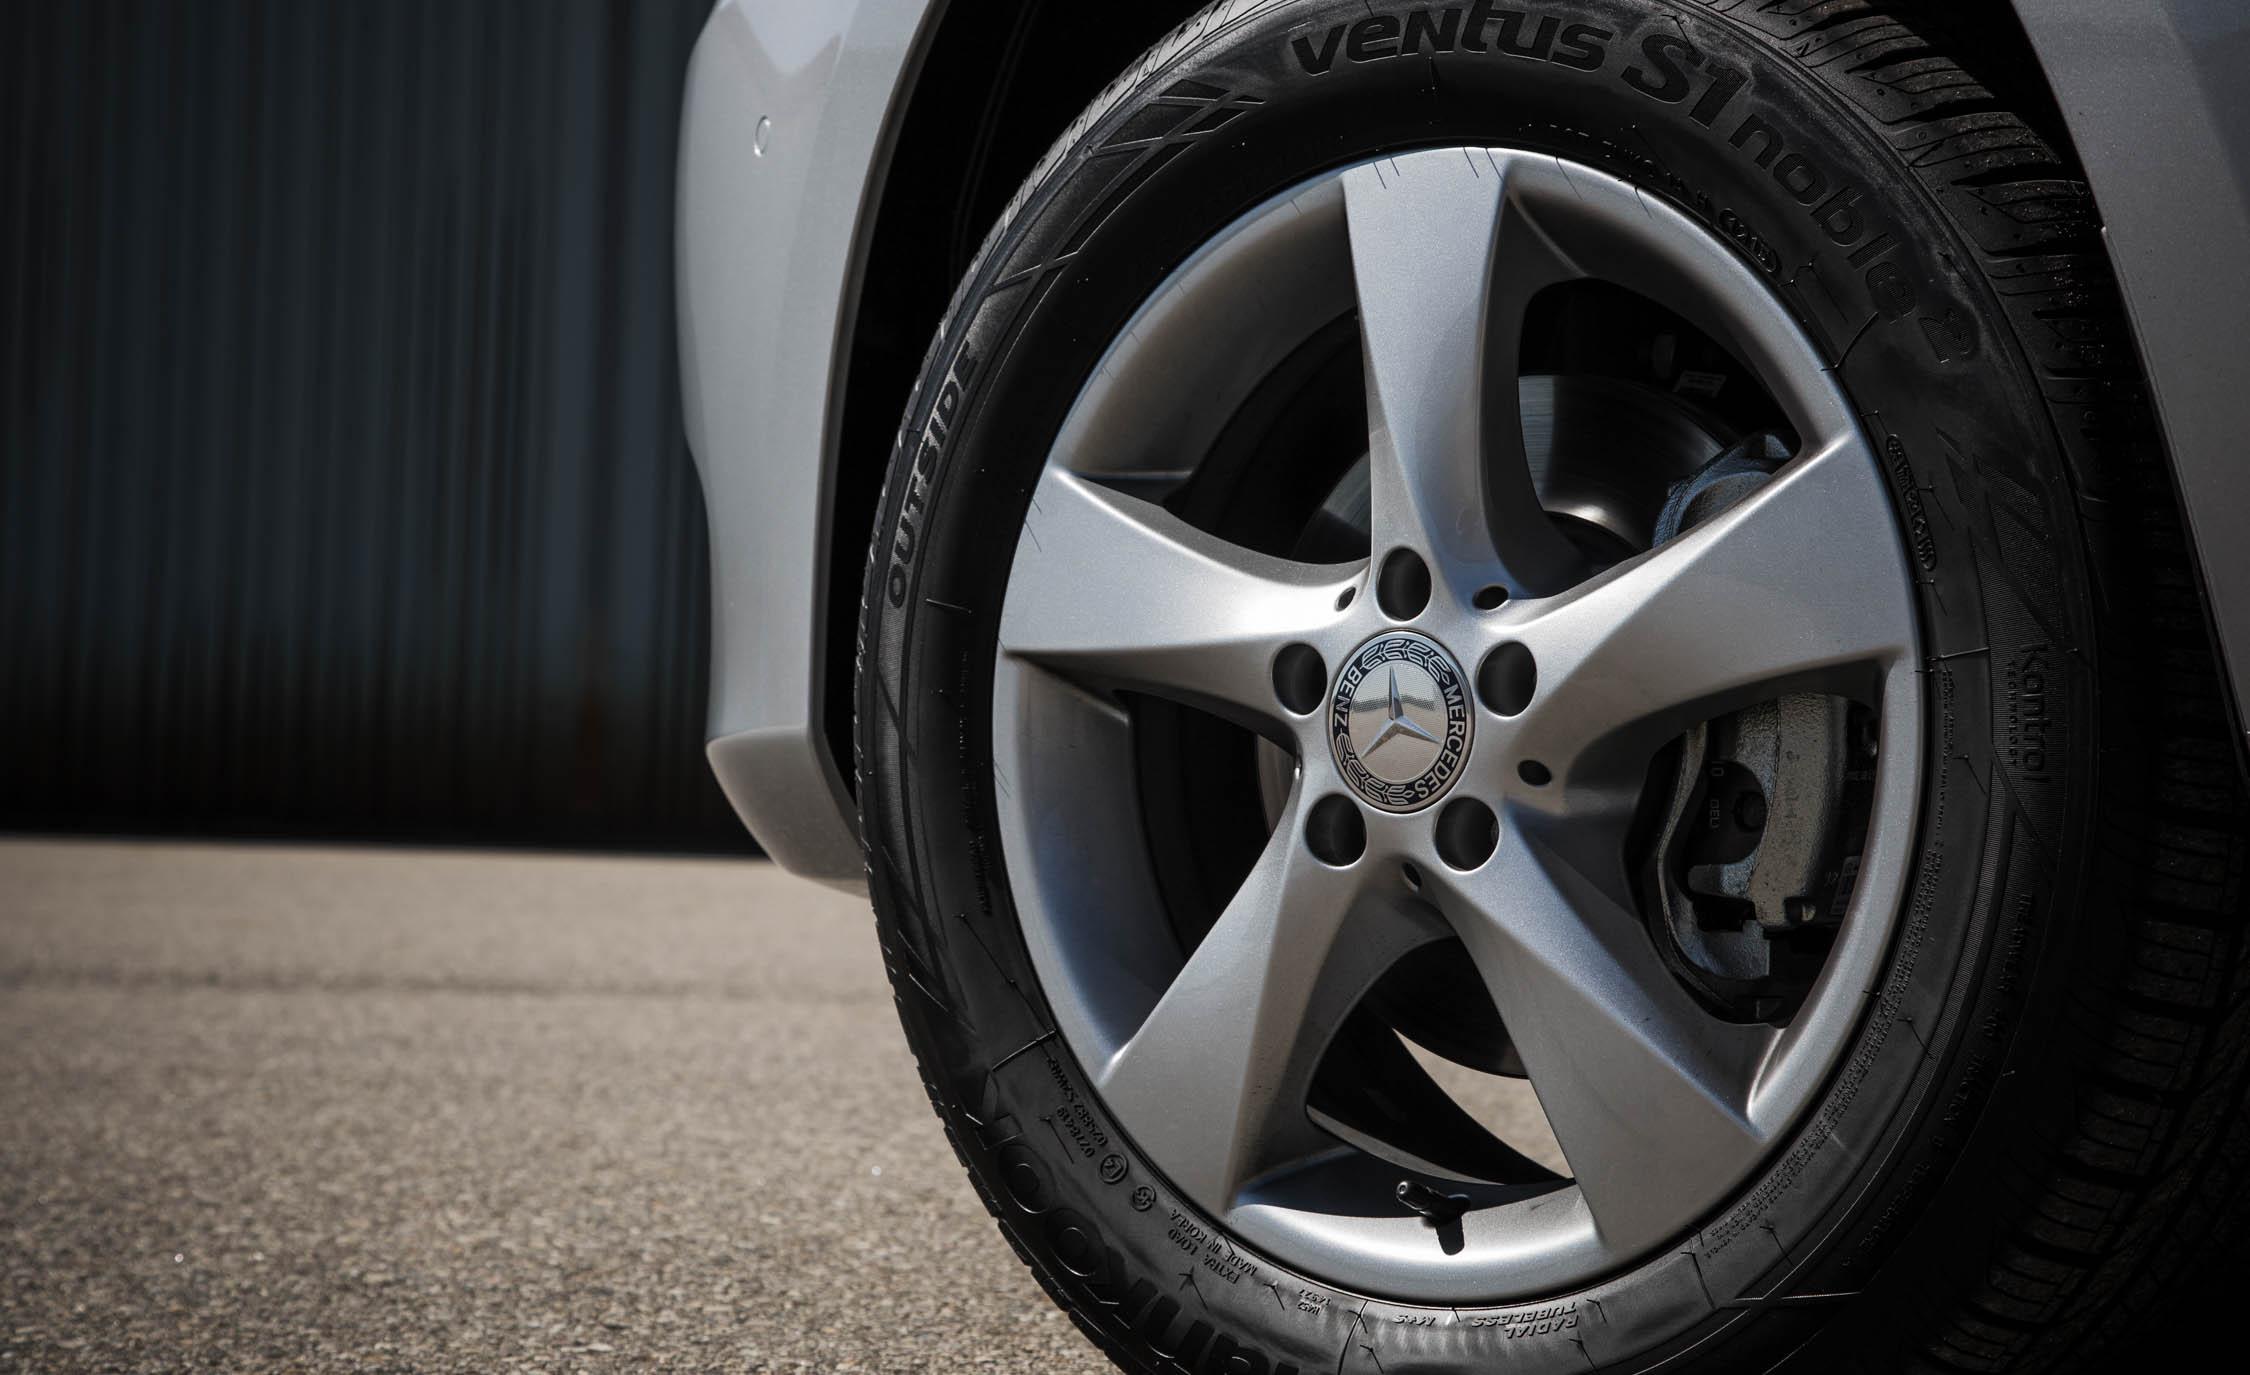 2016 Mercedes-Benz Metris Exterior Wheel